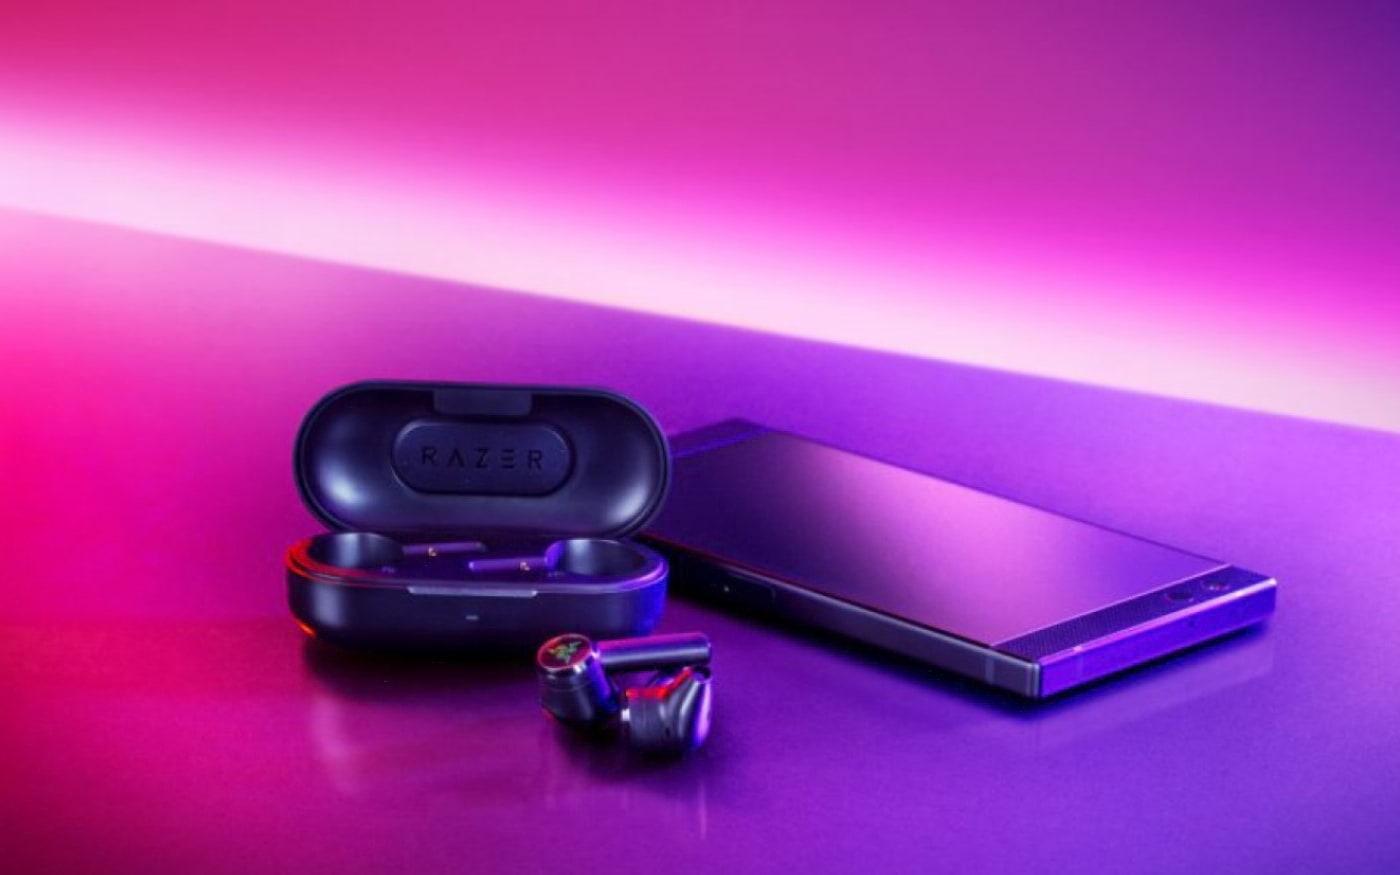 [Razer Hammerhead True Wireless Earbuds] Empresa anuncia seus novos fones de ouvido TWS